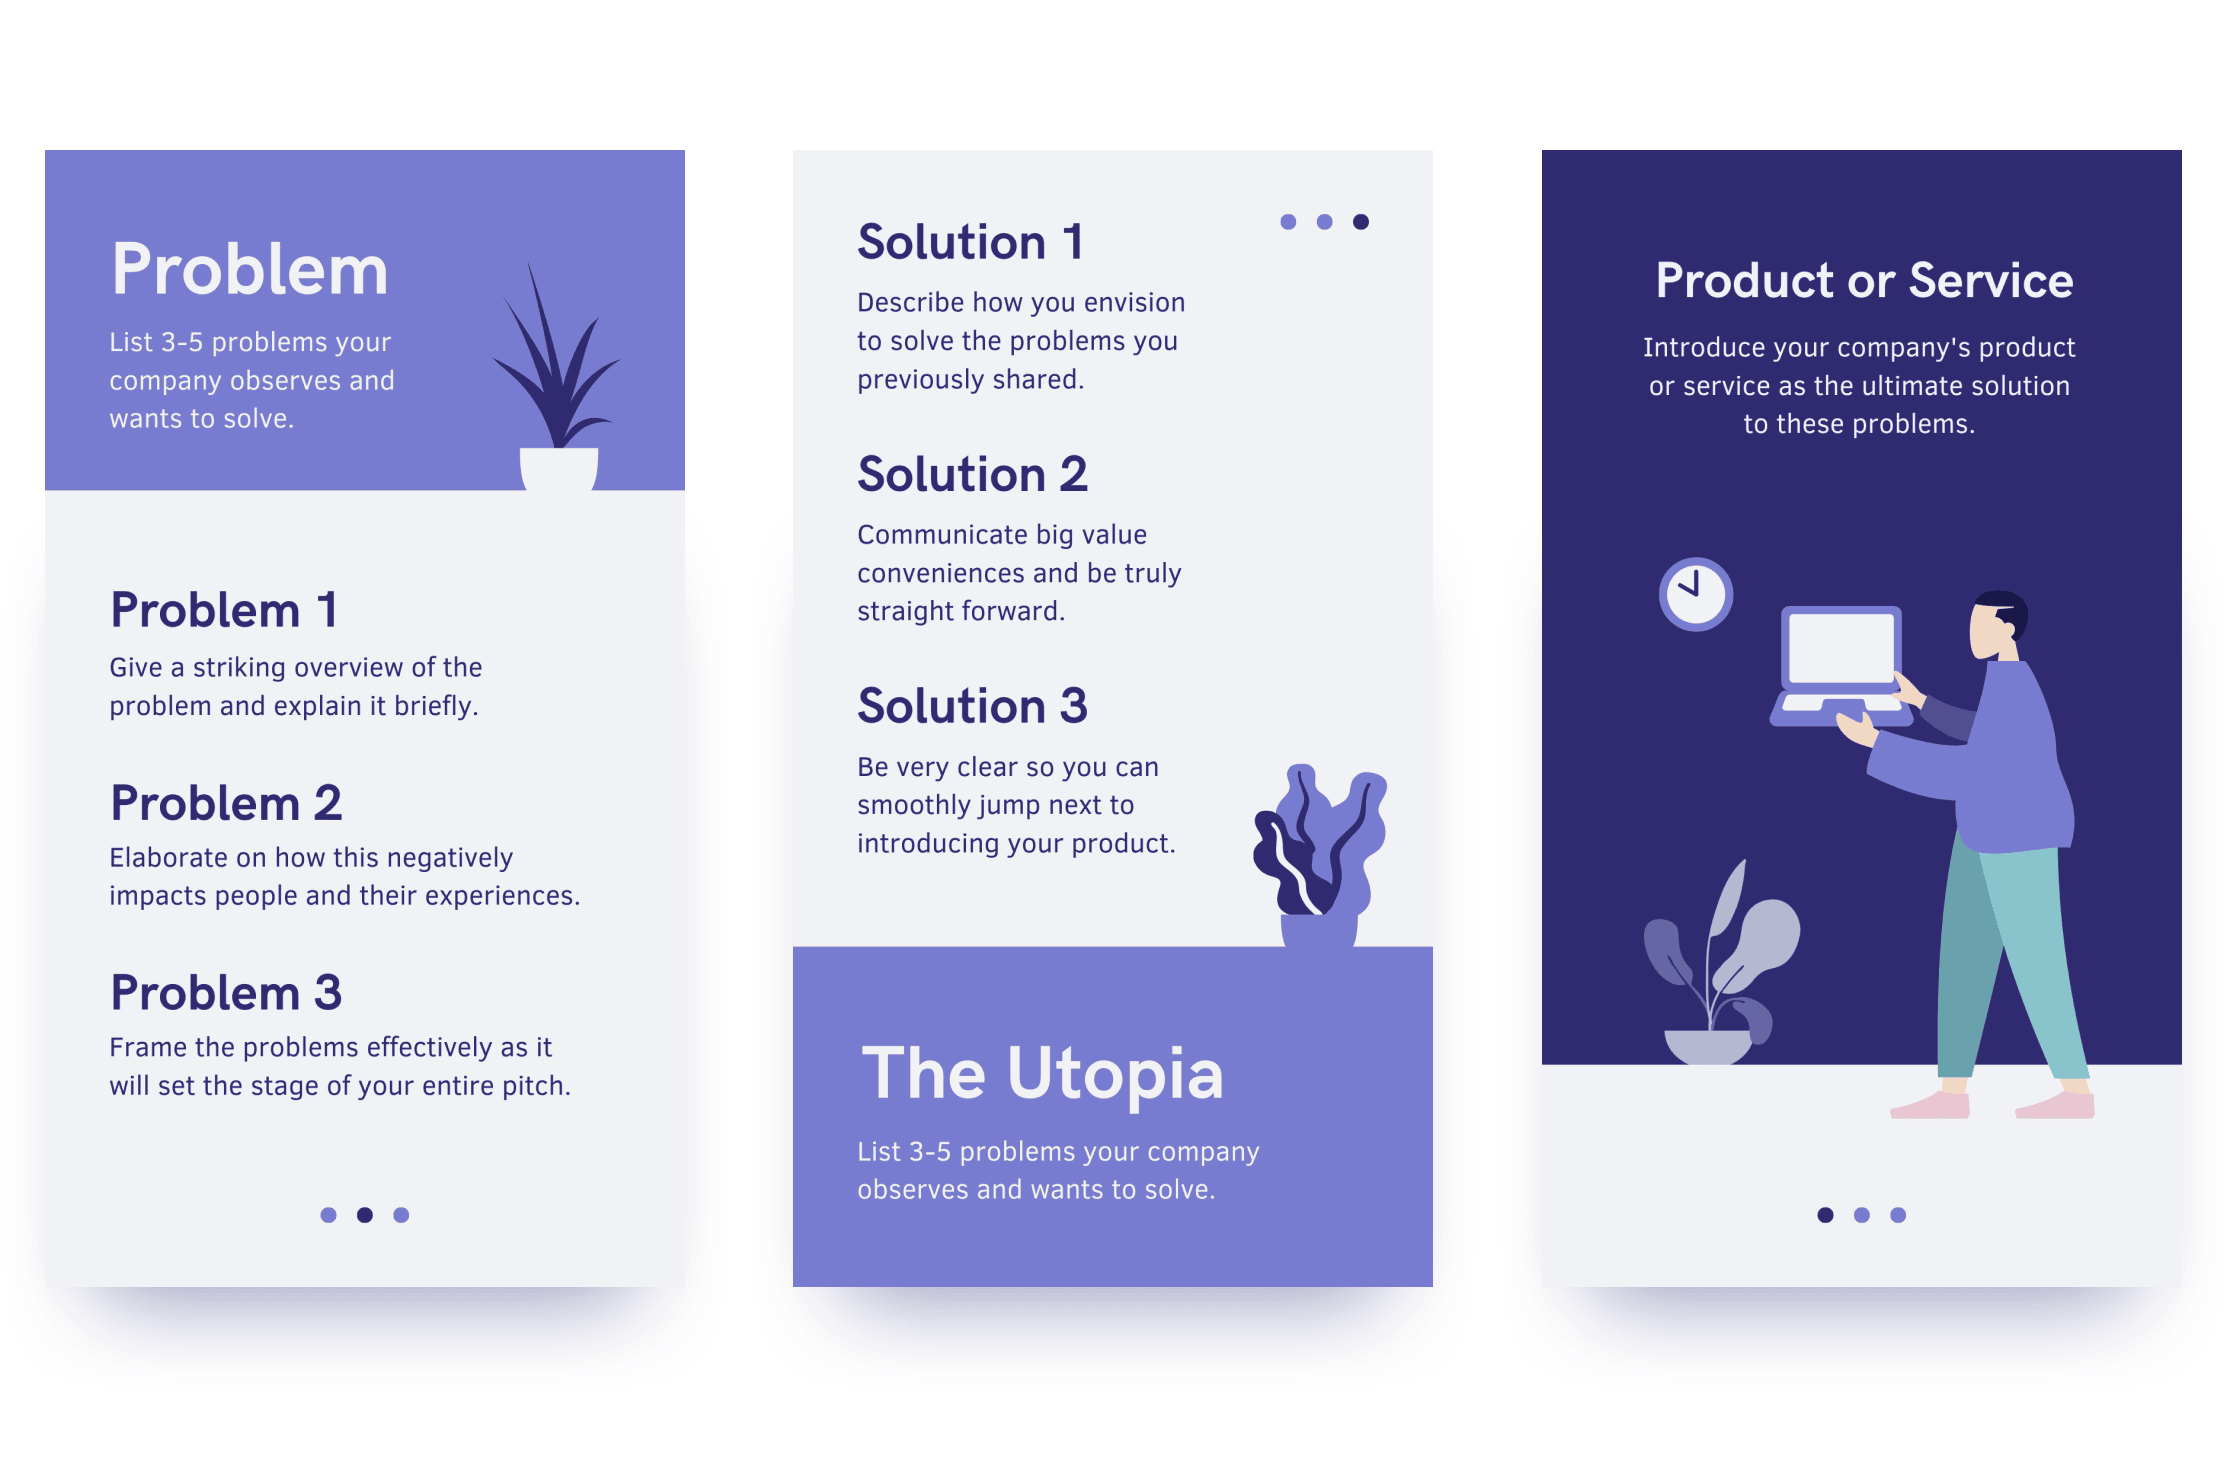 Mobile first presentation slide layouts